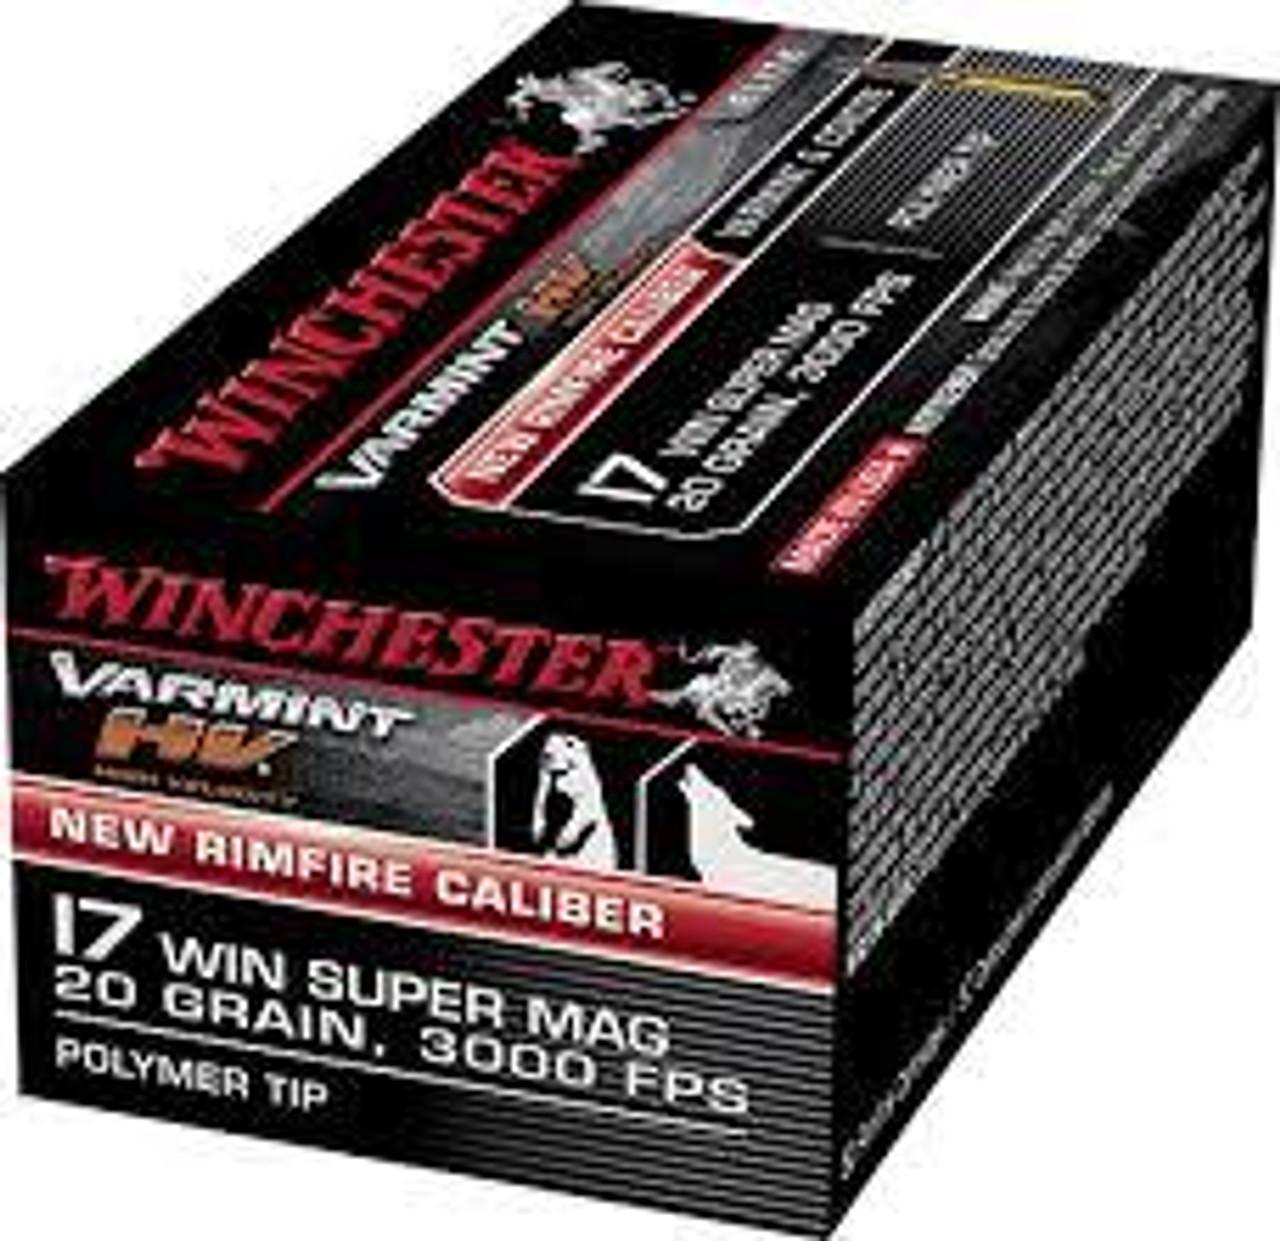 17 Winchester Super Magnum Ammo